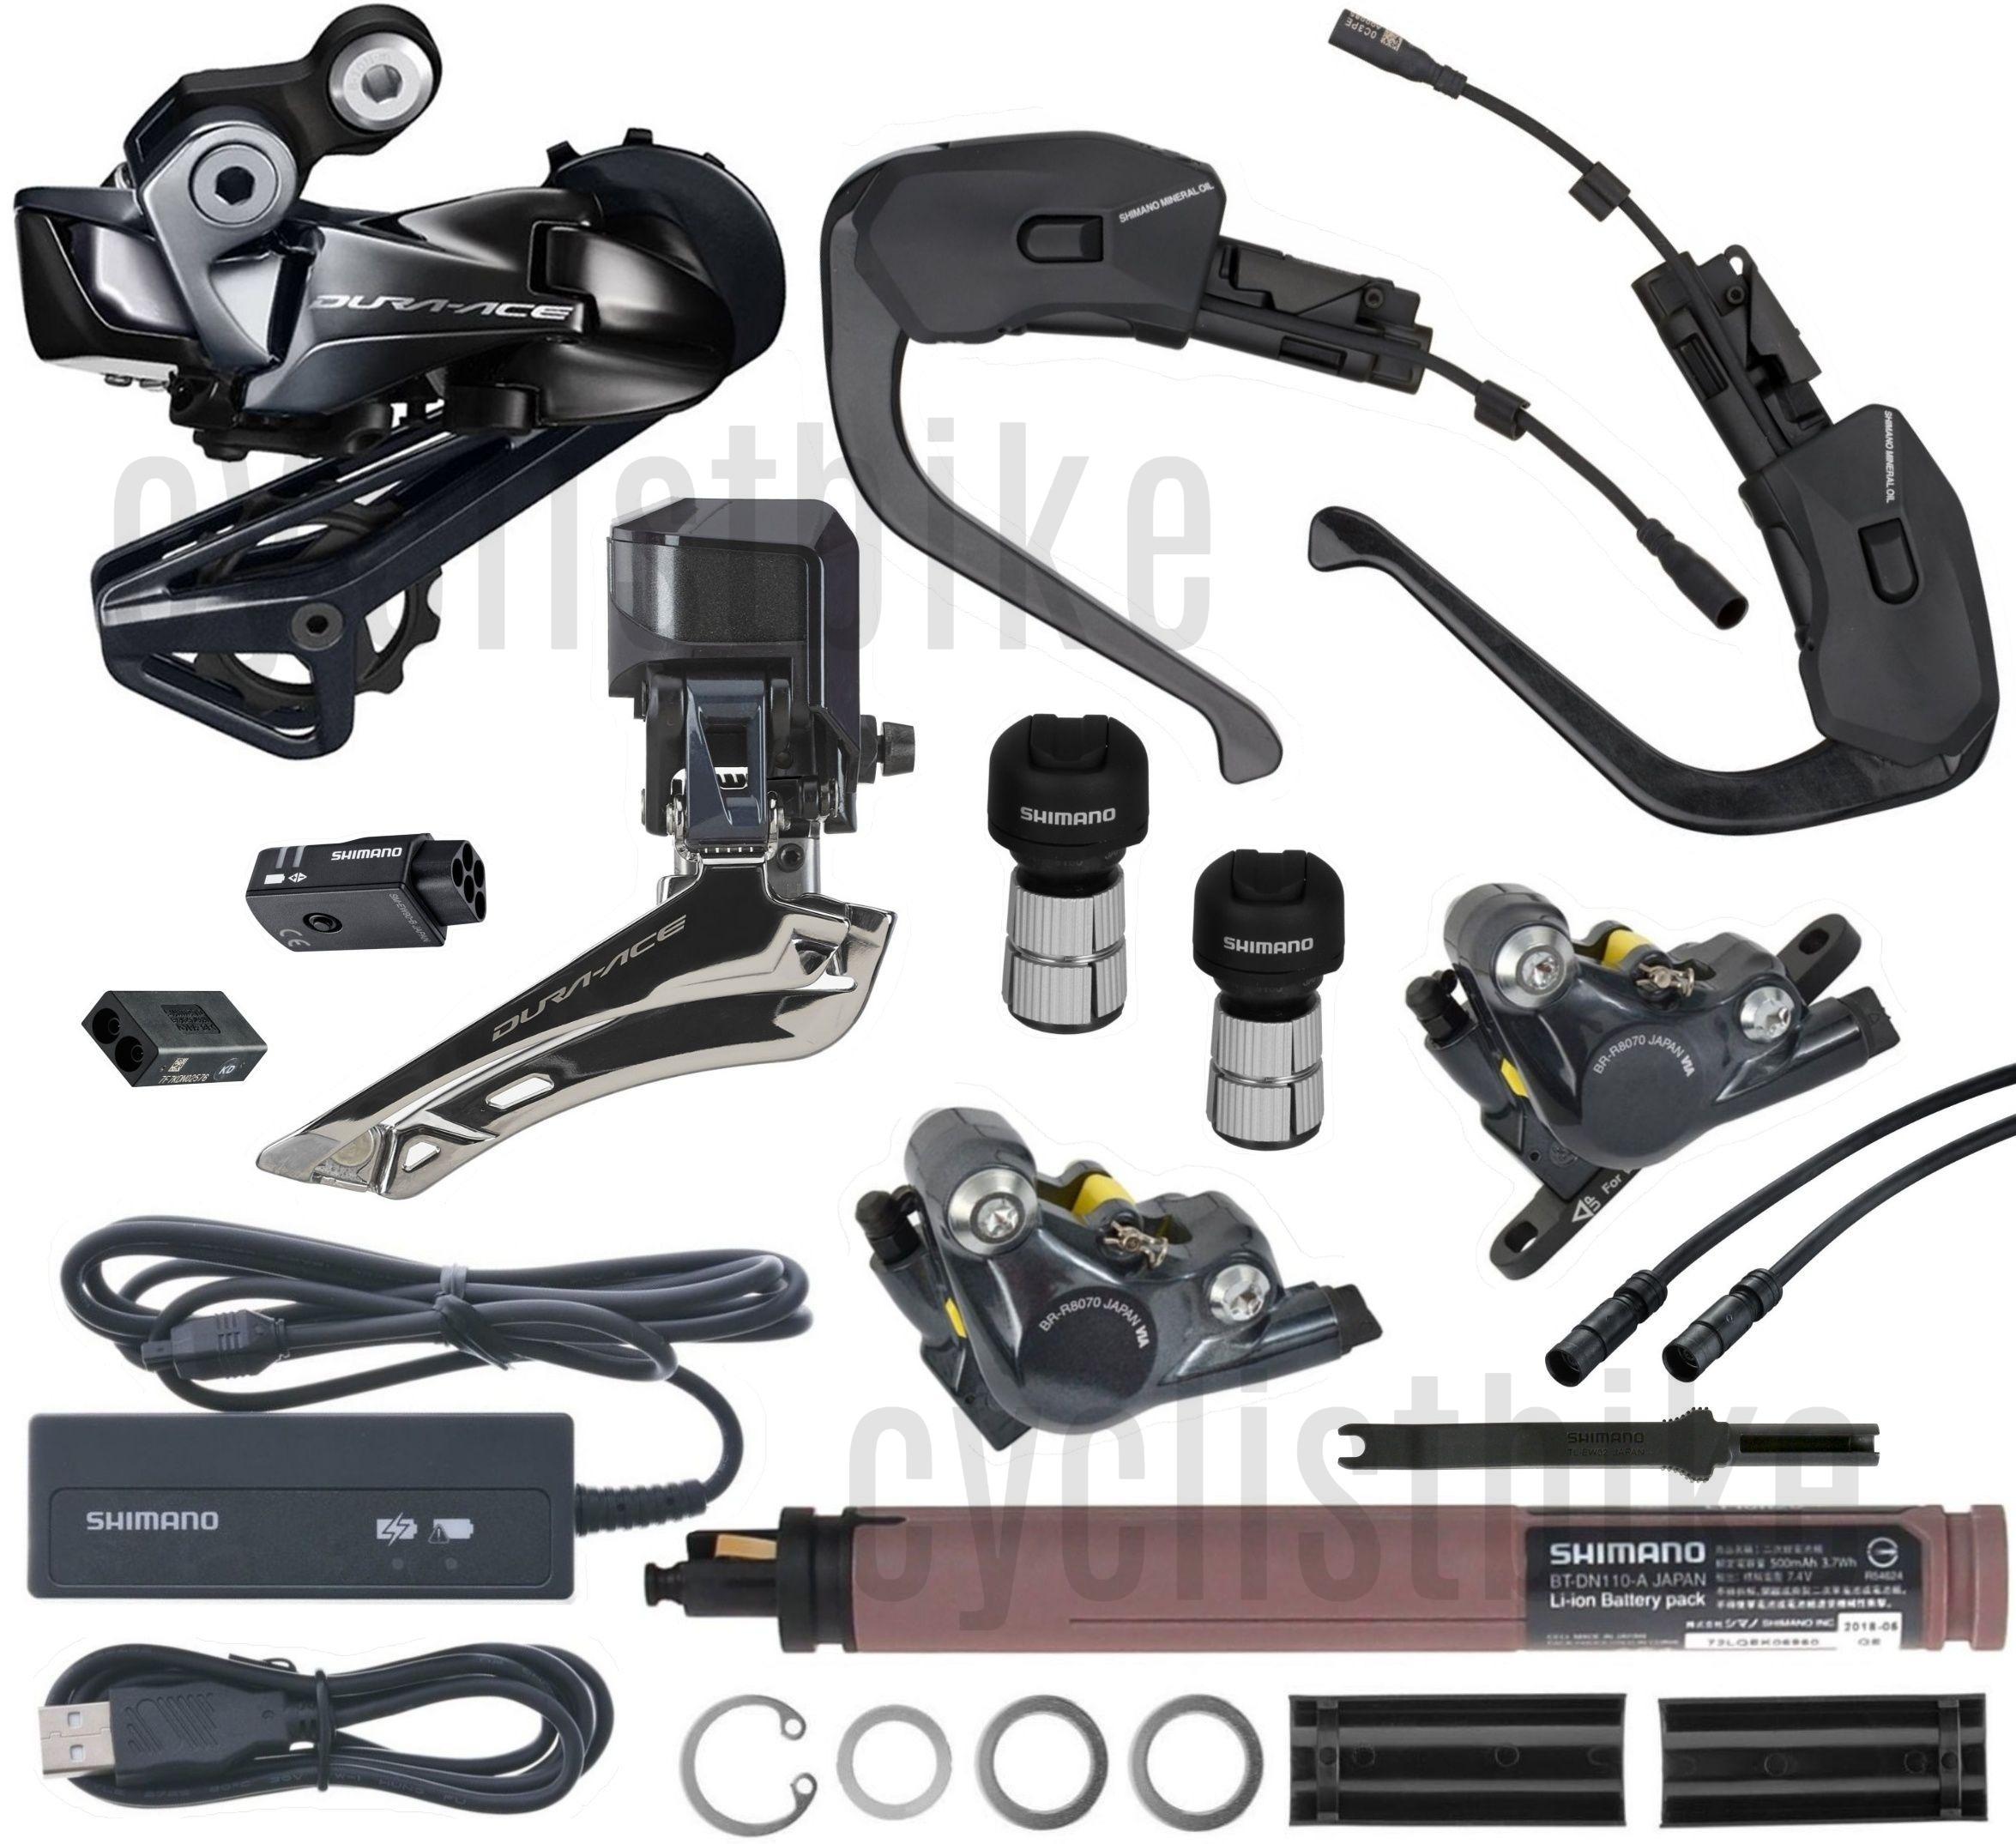 Shimano Ultegra R8060 Time Trial//Triathlon Di2 Electric Upgrade Kit NIB SS//GS